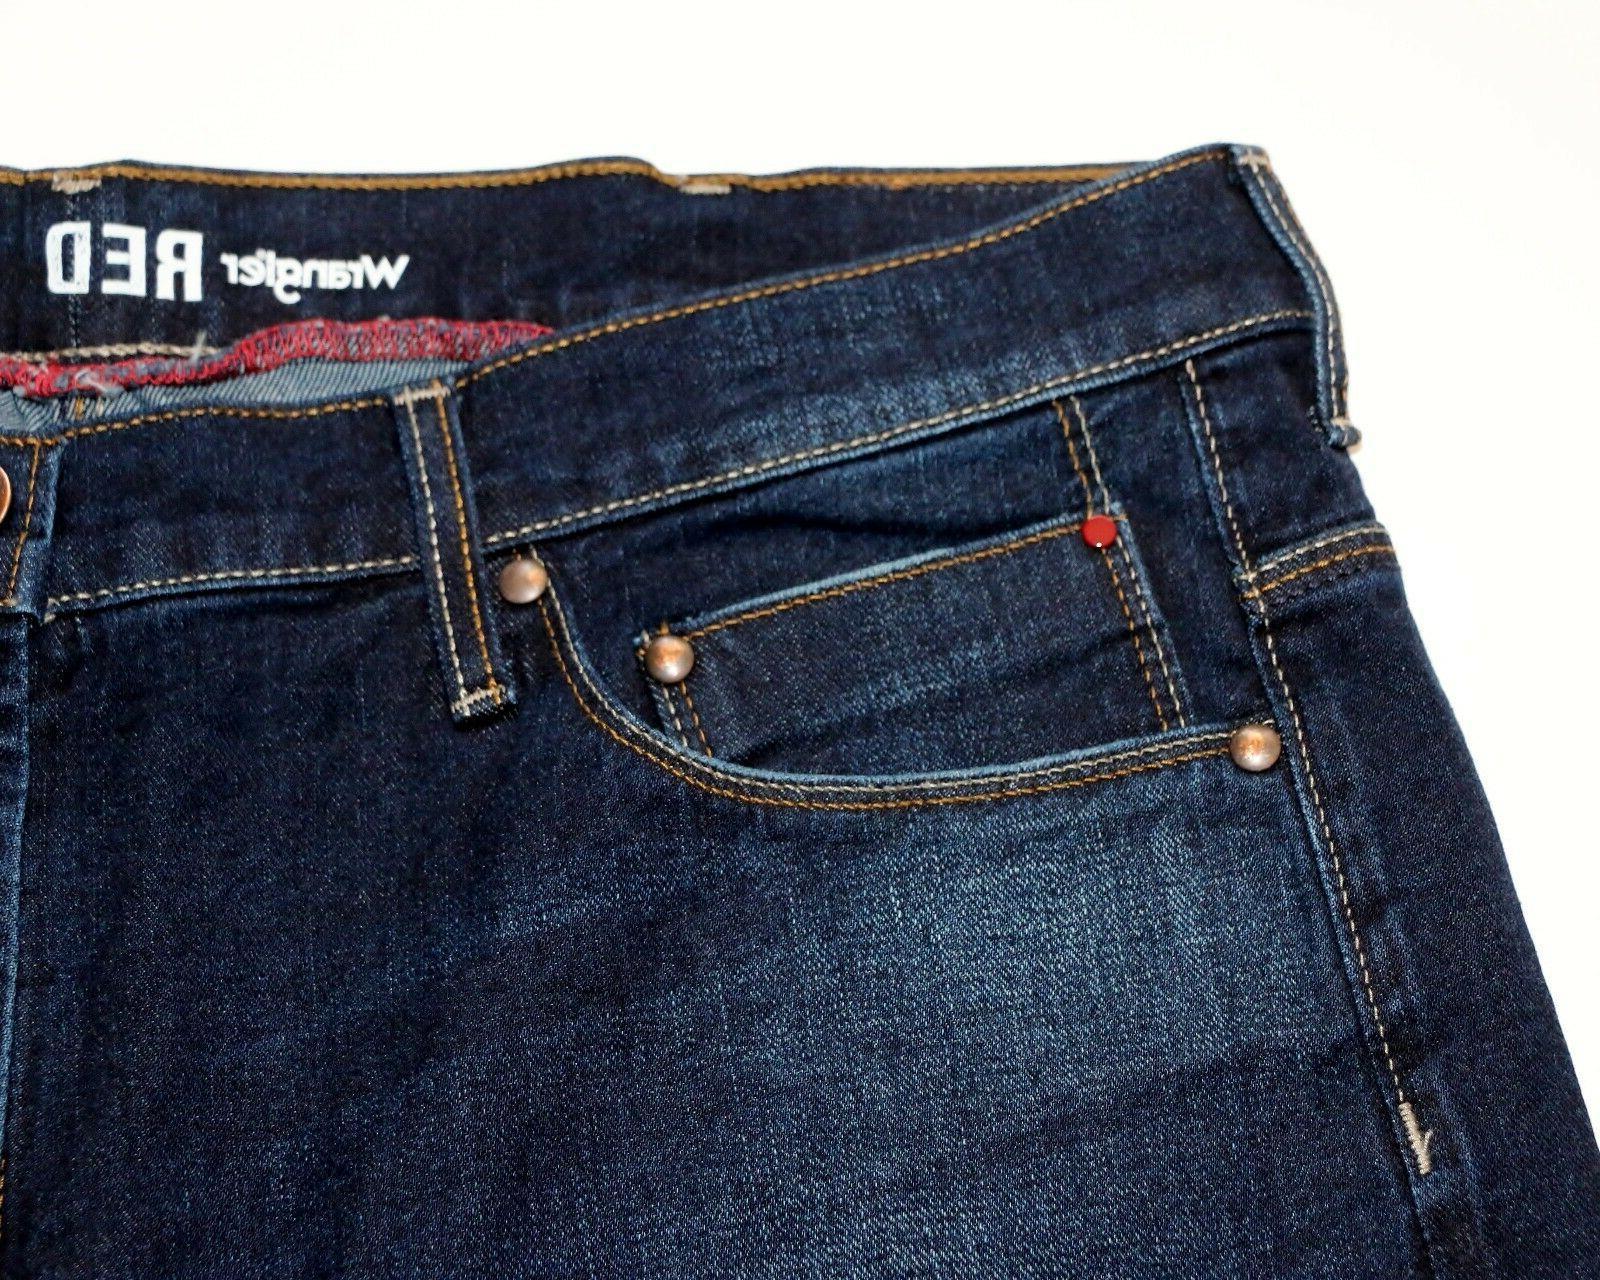 New Fit Jeans Japanese Selvedge Denim